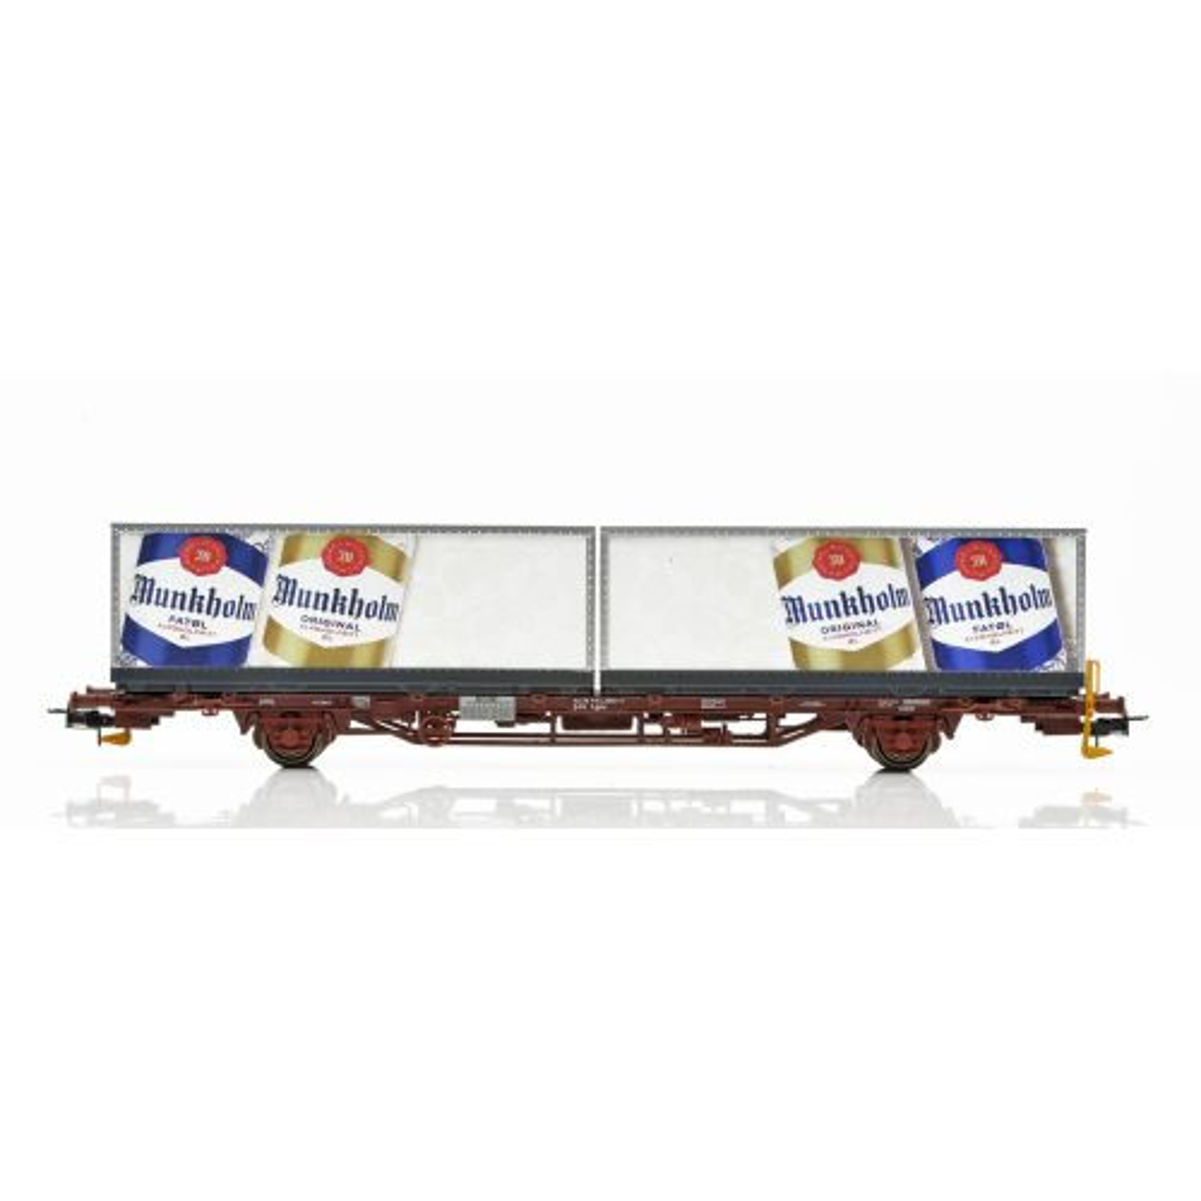 Topline Godsvogner, nmj-topline-nmjt507123-cargonet-lgns-42-77-443-2209-6-munkholm-non-alcoholic-beer-containers-25-feet, NMJT507.123